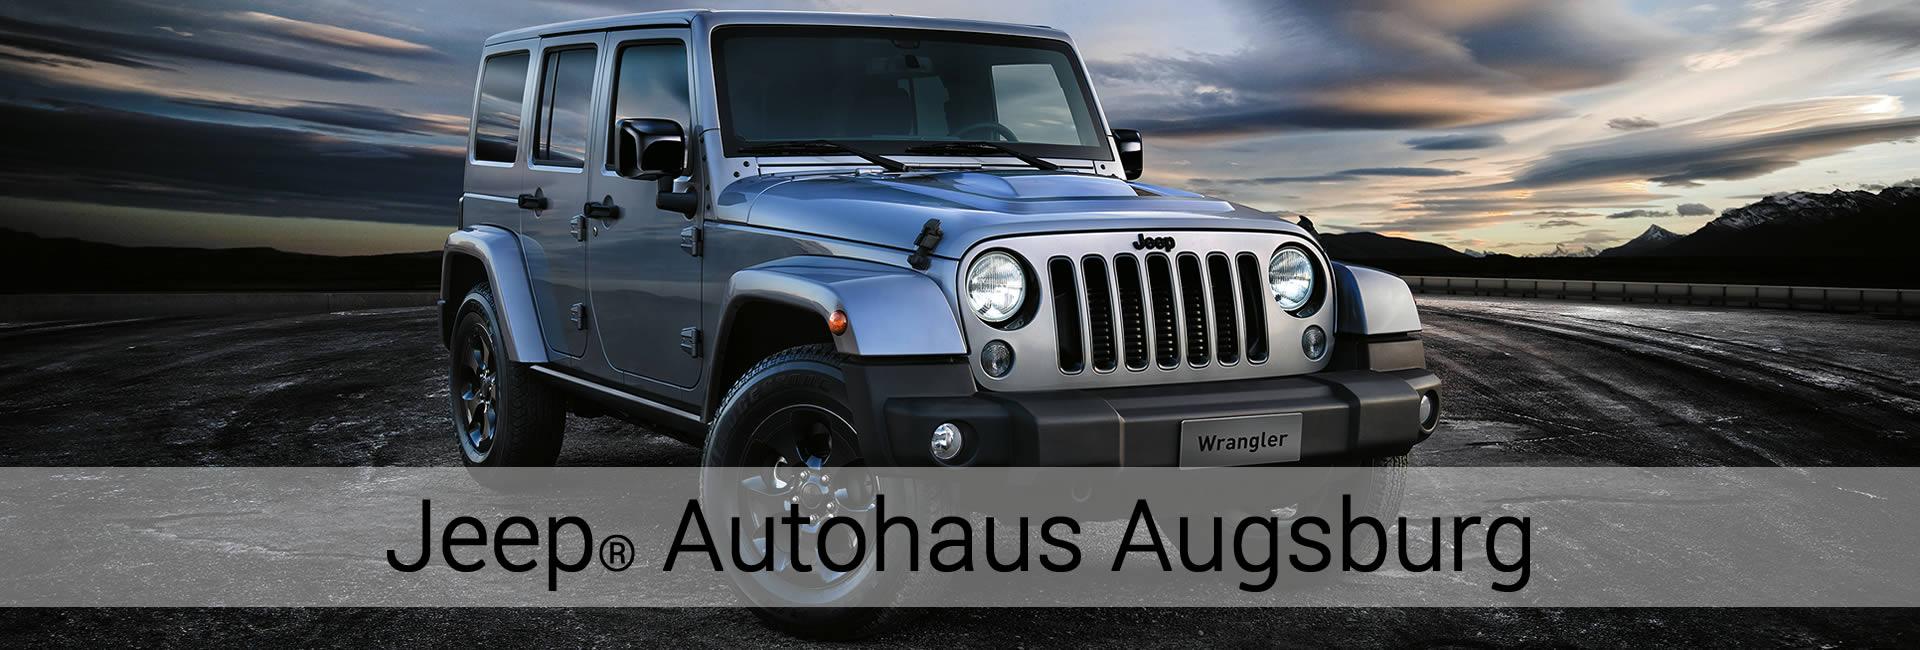 Jeep® Autohaus Augsburg